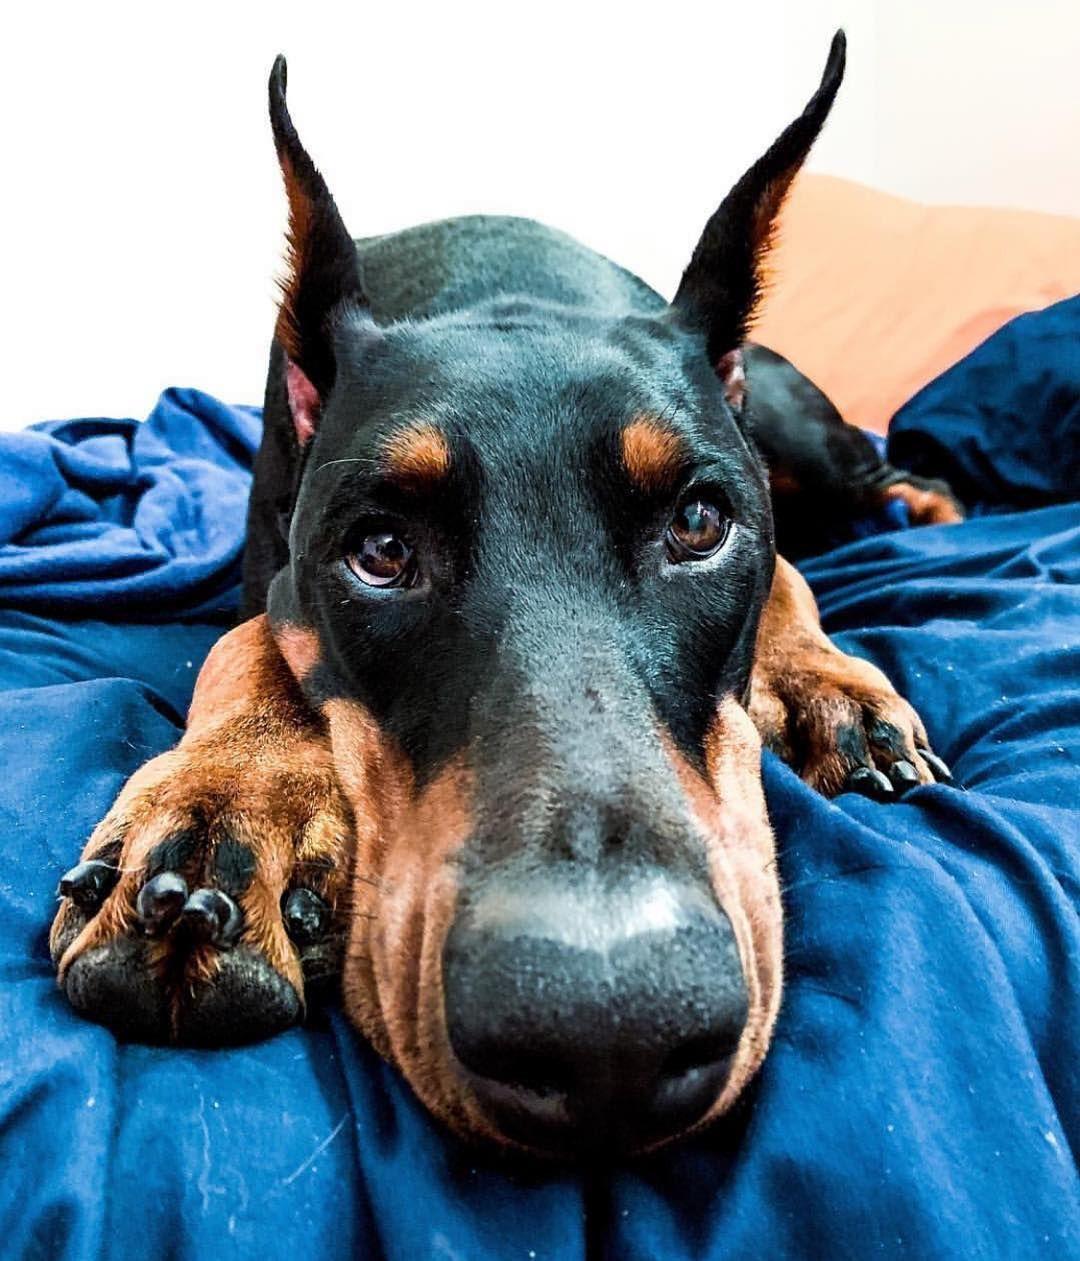 Guard Dog Training Guarddogtraining Doberman Pinscher Dog Dog